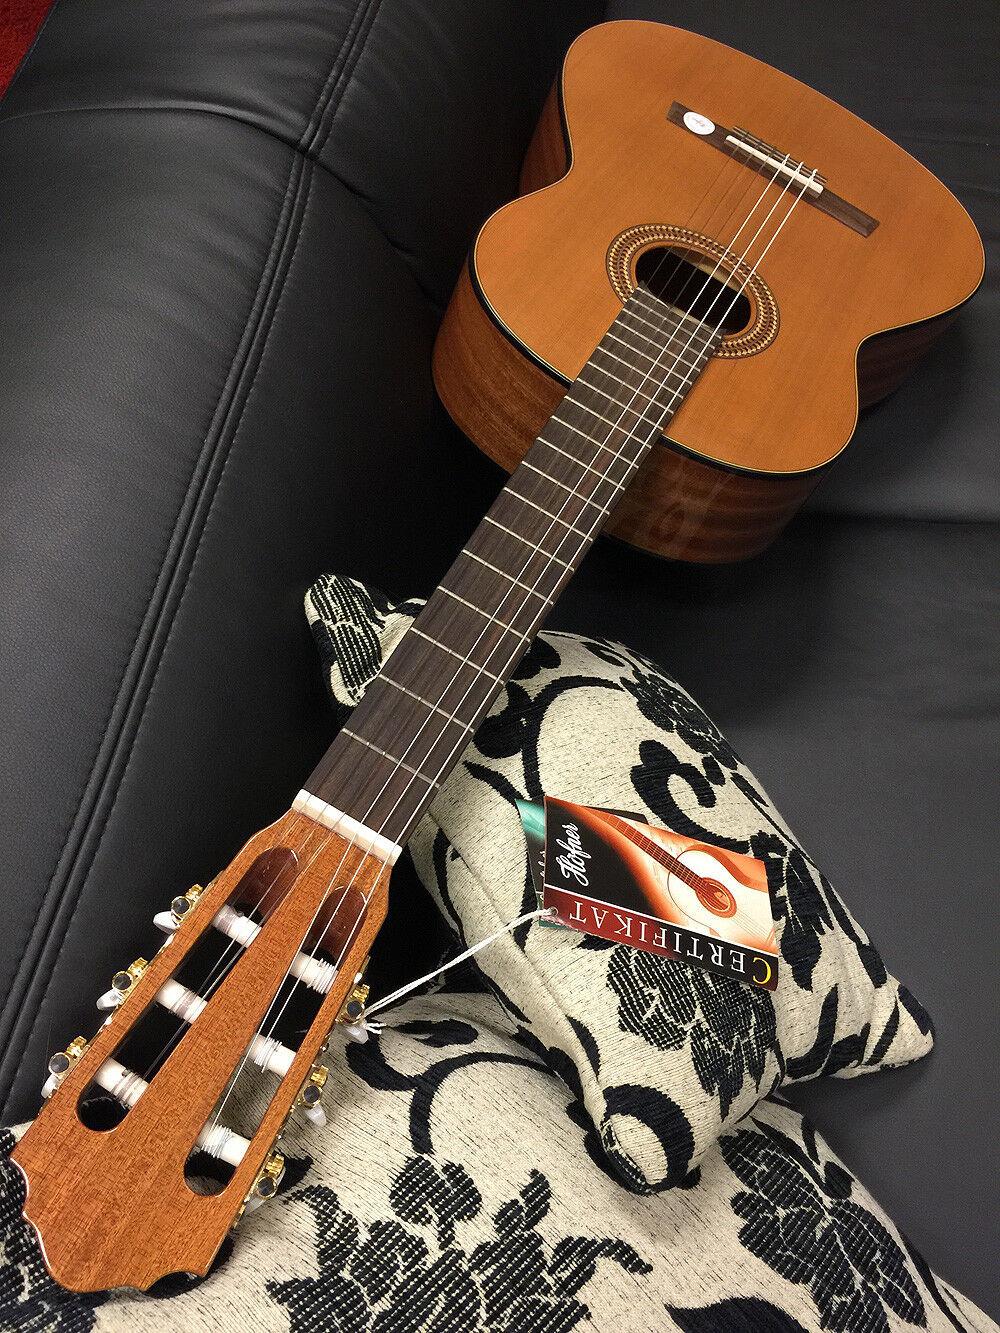 HÖFNER HHM-MZ Klassik Konzert-Gitarre 4 4